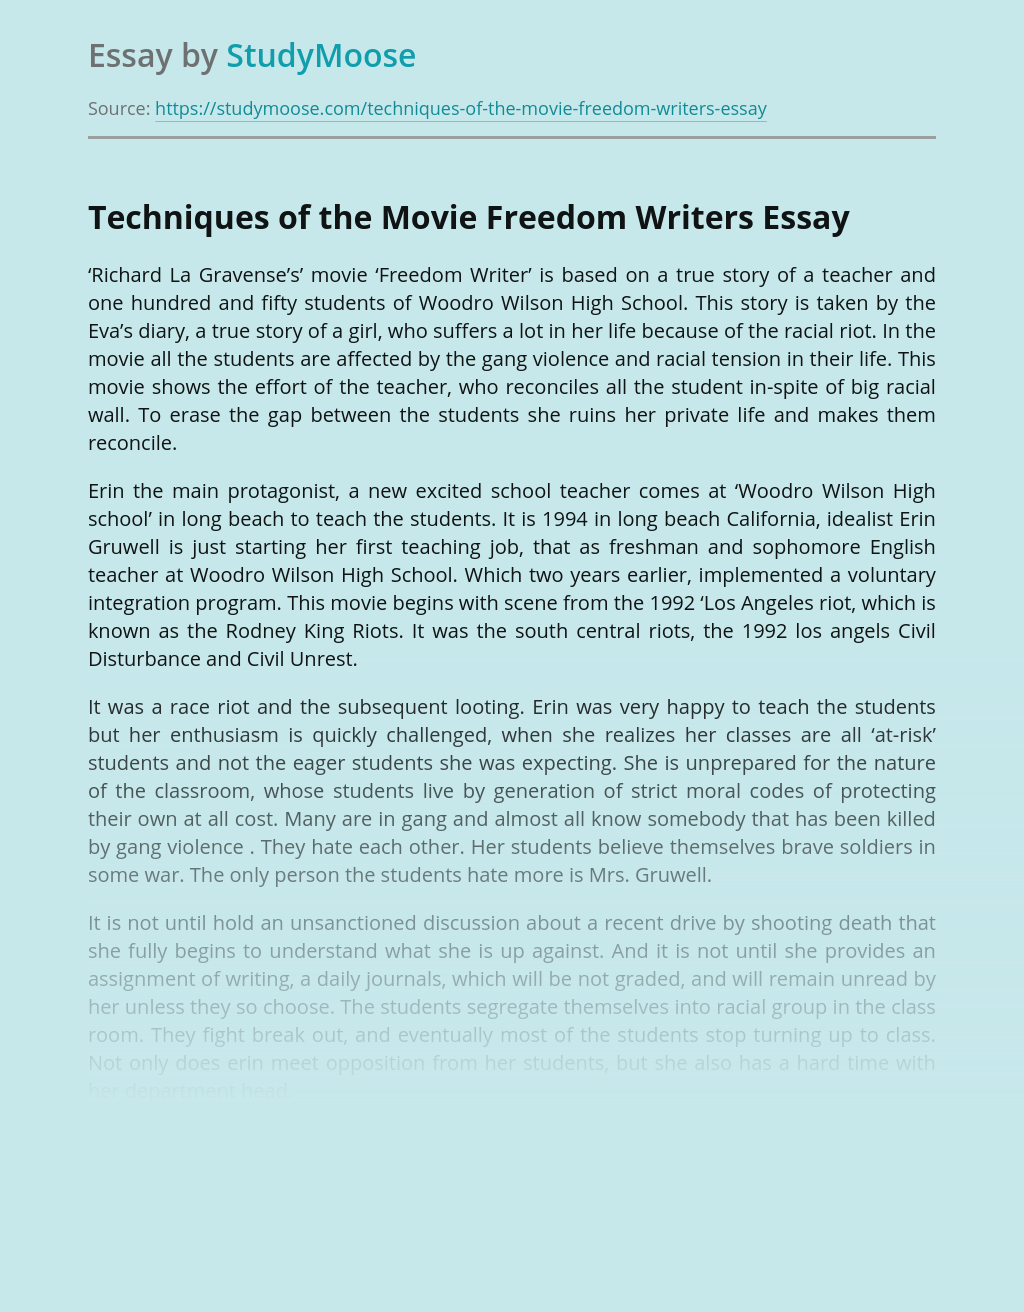 Freedom writers movie essay help